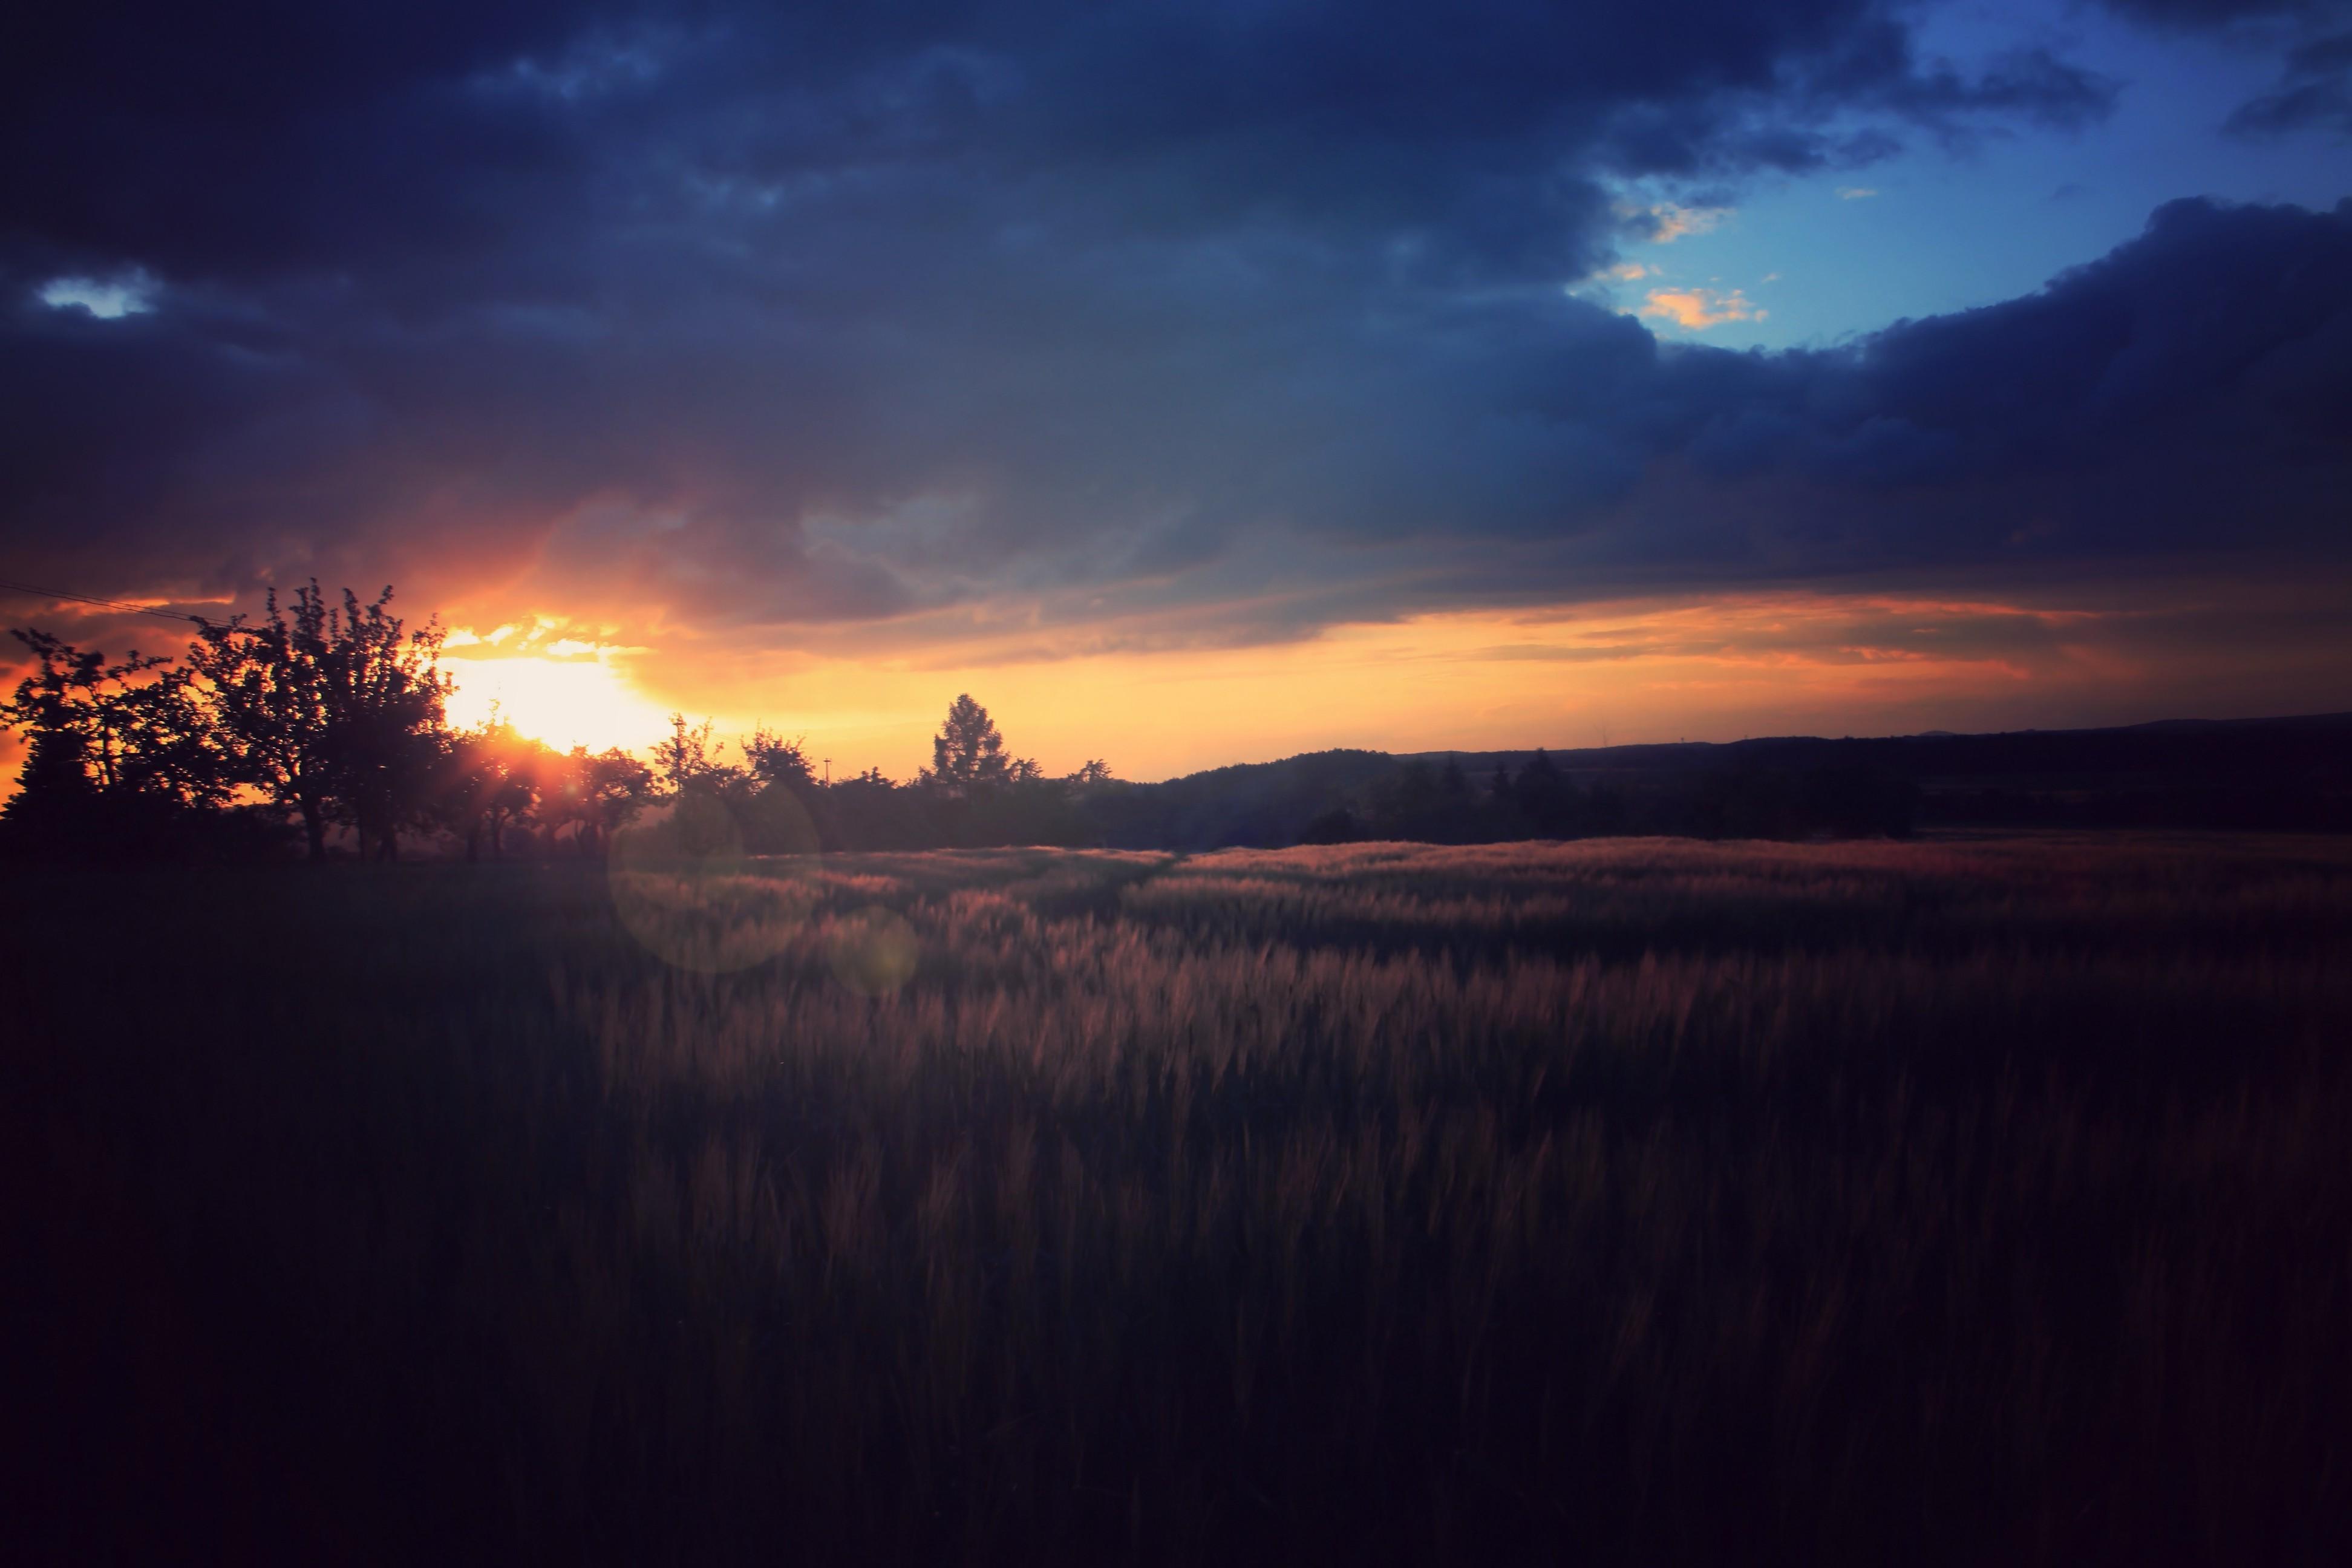 Wallpaper : 3888x2592 Px, Nature, Night, Sunset 3888x2592